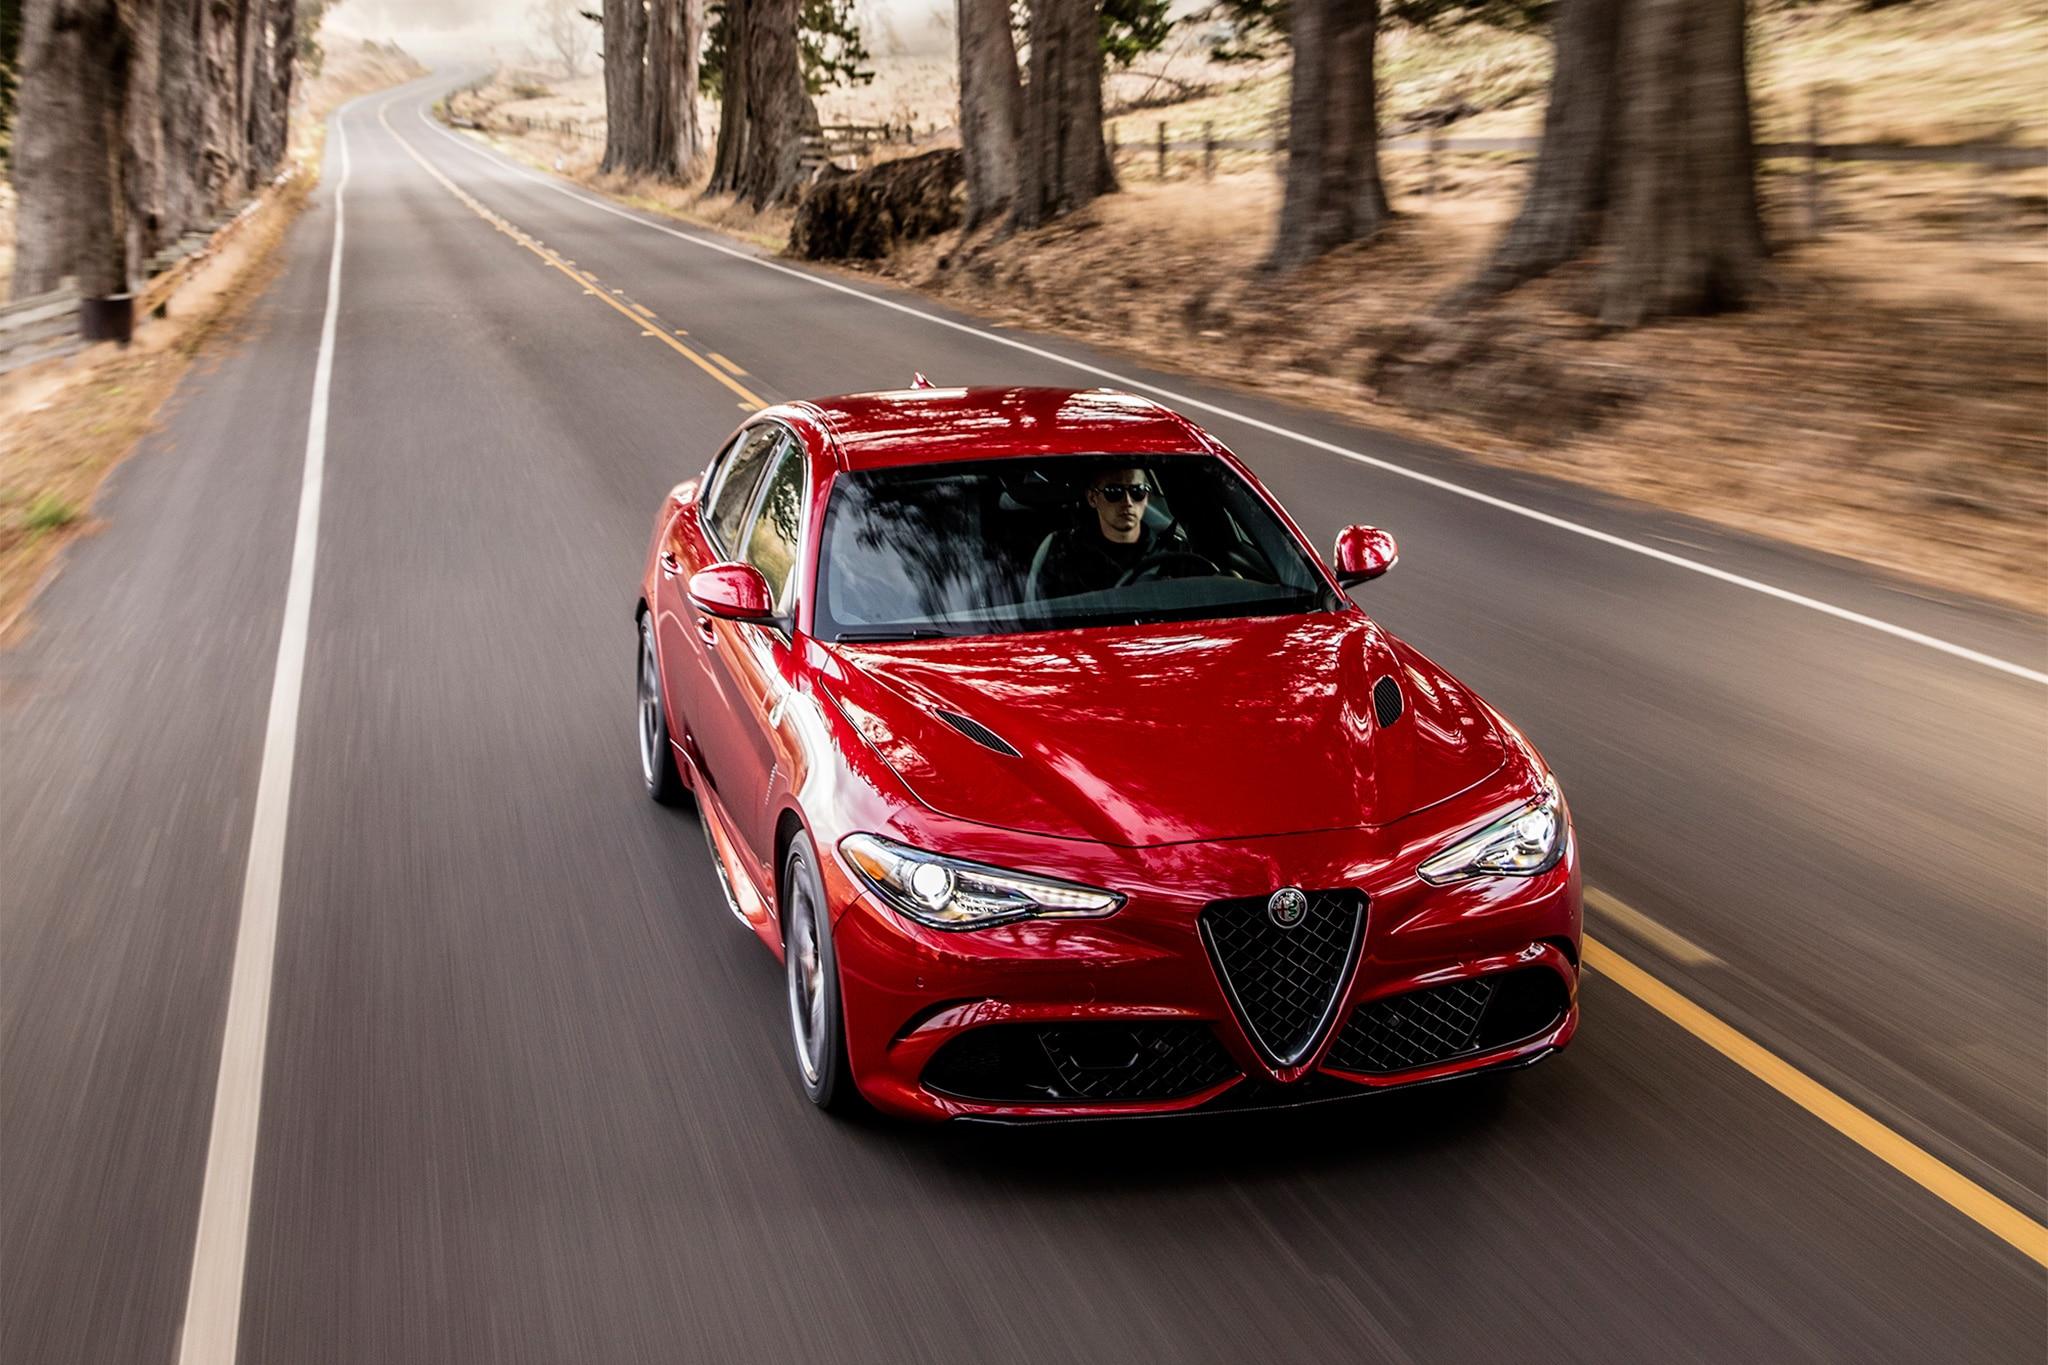 2017 Alfa Romeo Giulia Quadrifoglio One Week Review ...